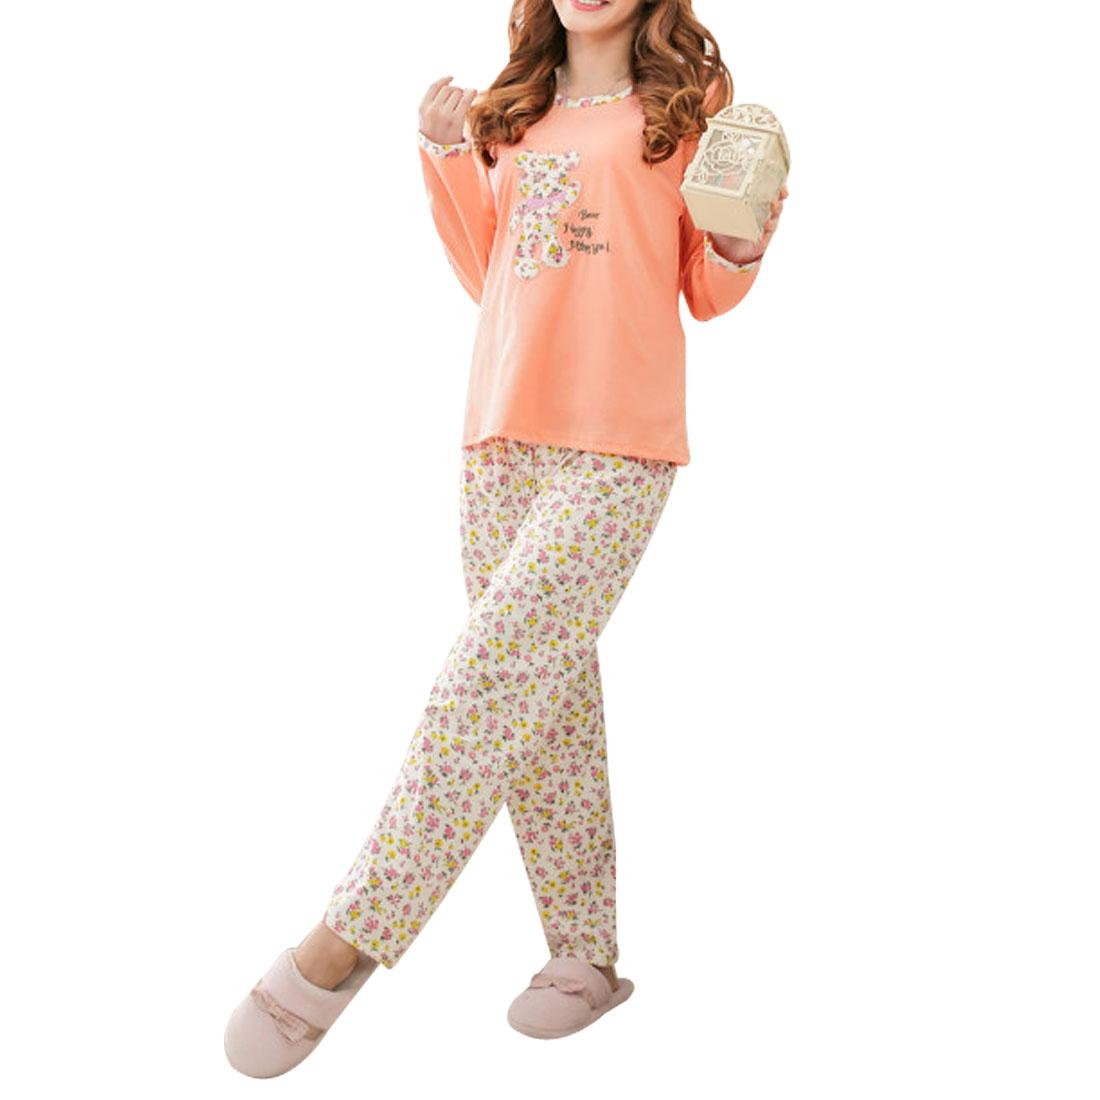 Women Flowers Printed Round Neck Leisure Pajama Sets Peach Pink White M